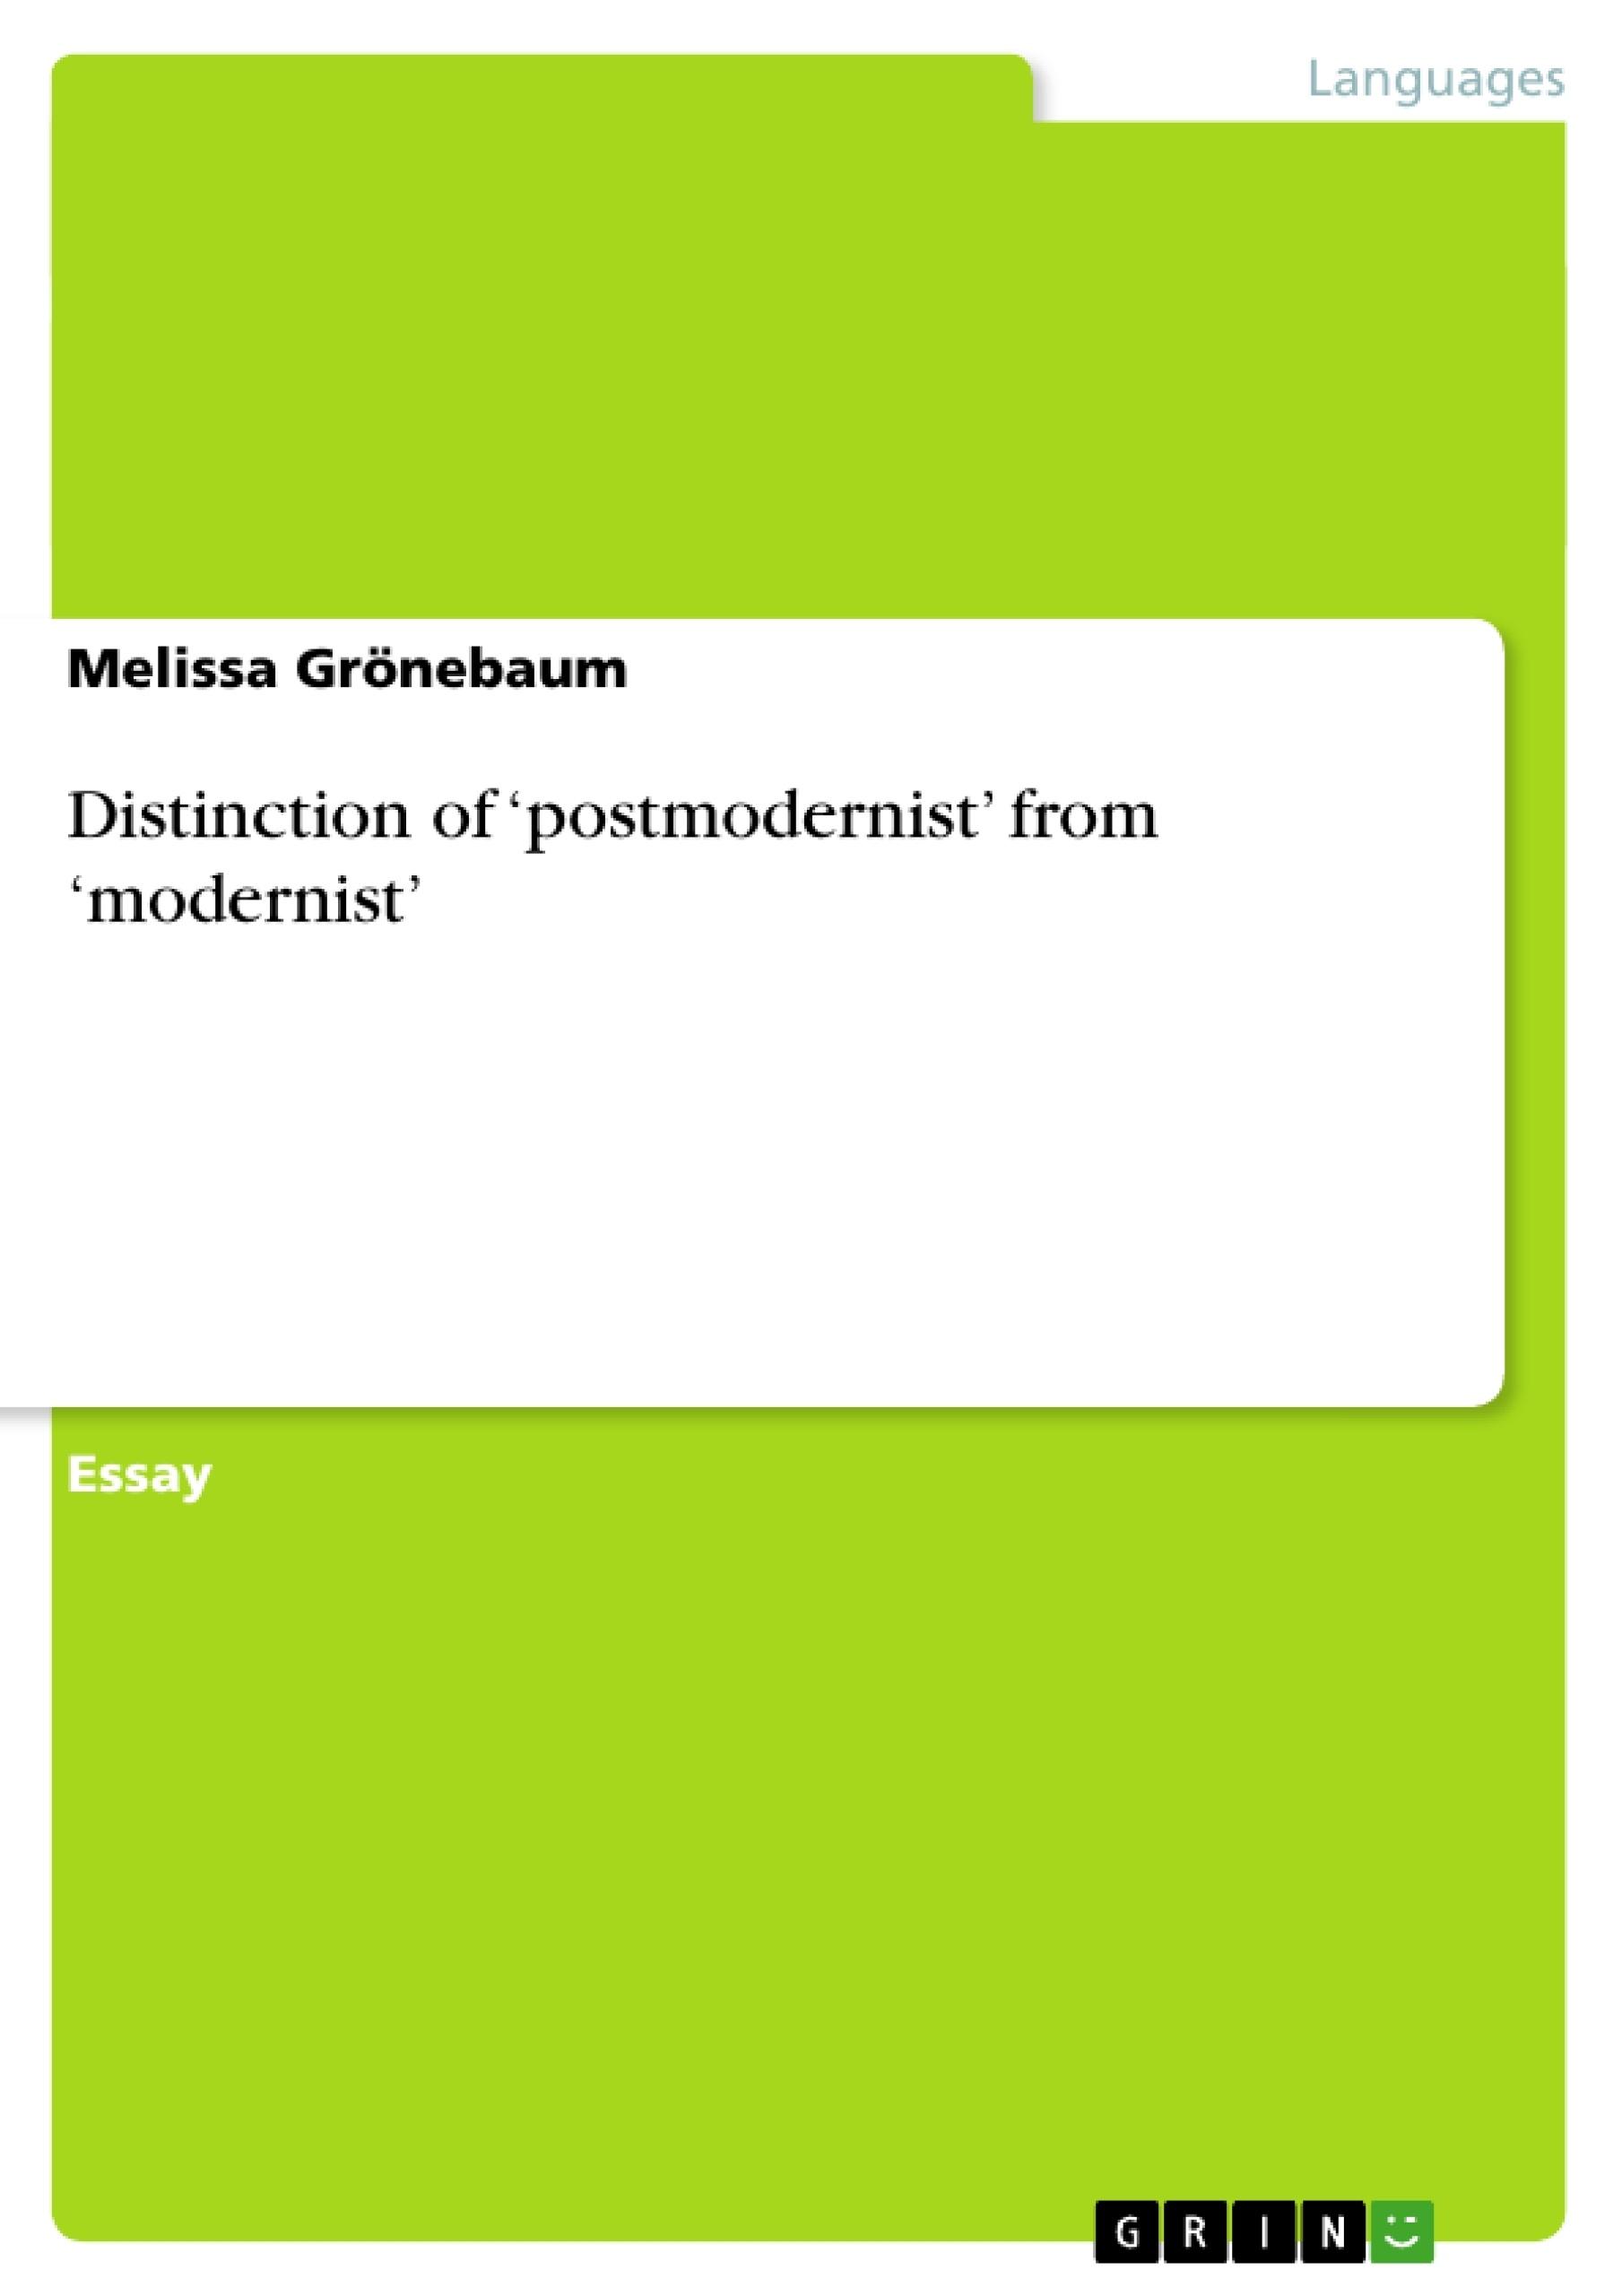 Title: Distinction of 'postmodernist' from 'modernist'